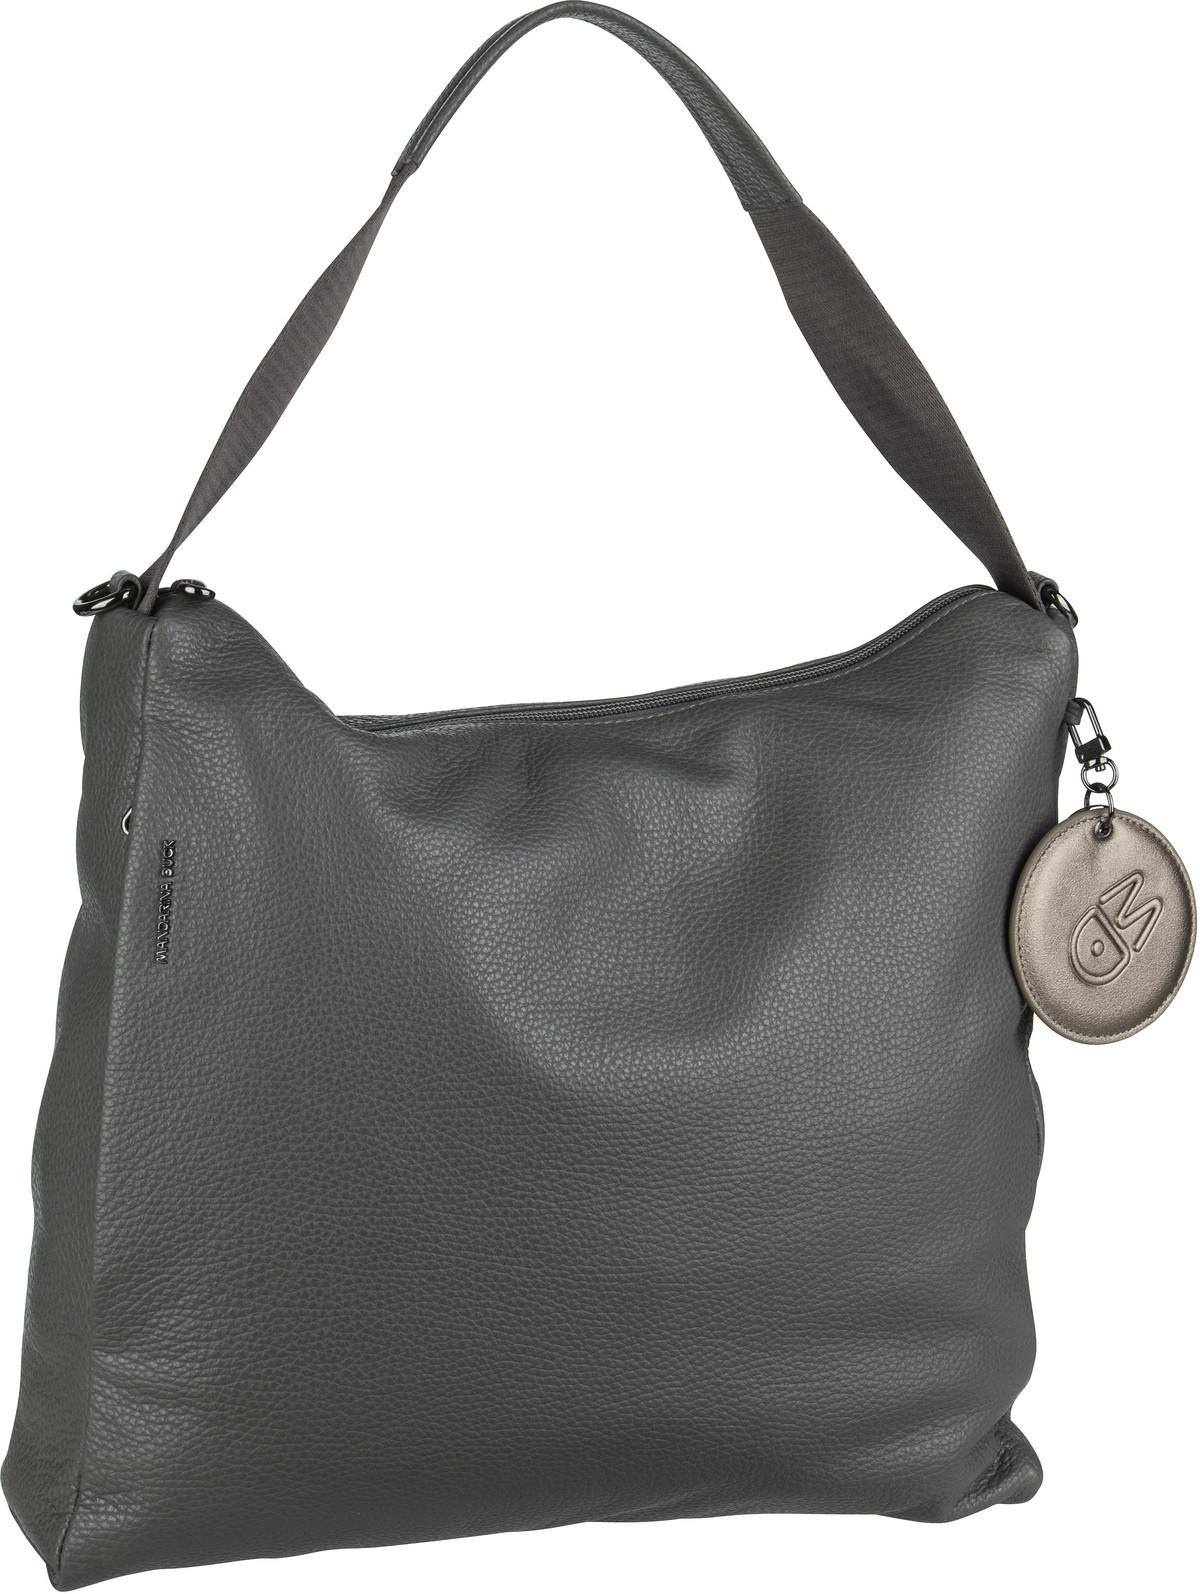 Handtasche Mellow Leather Medium Hobo FZT95 Smoked Pearl